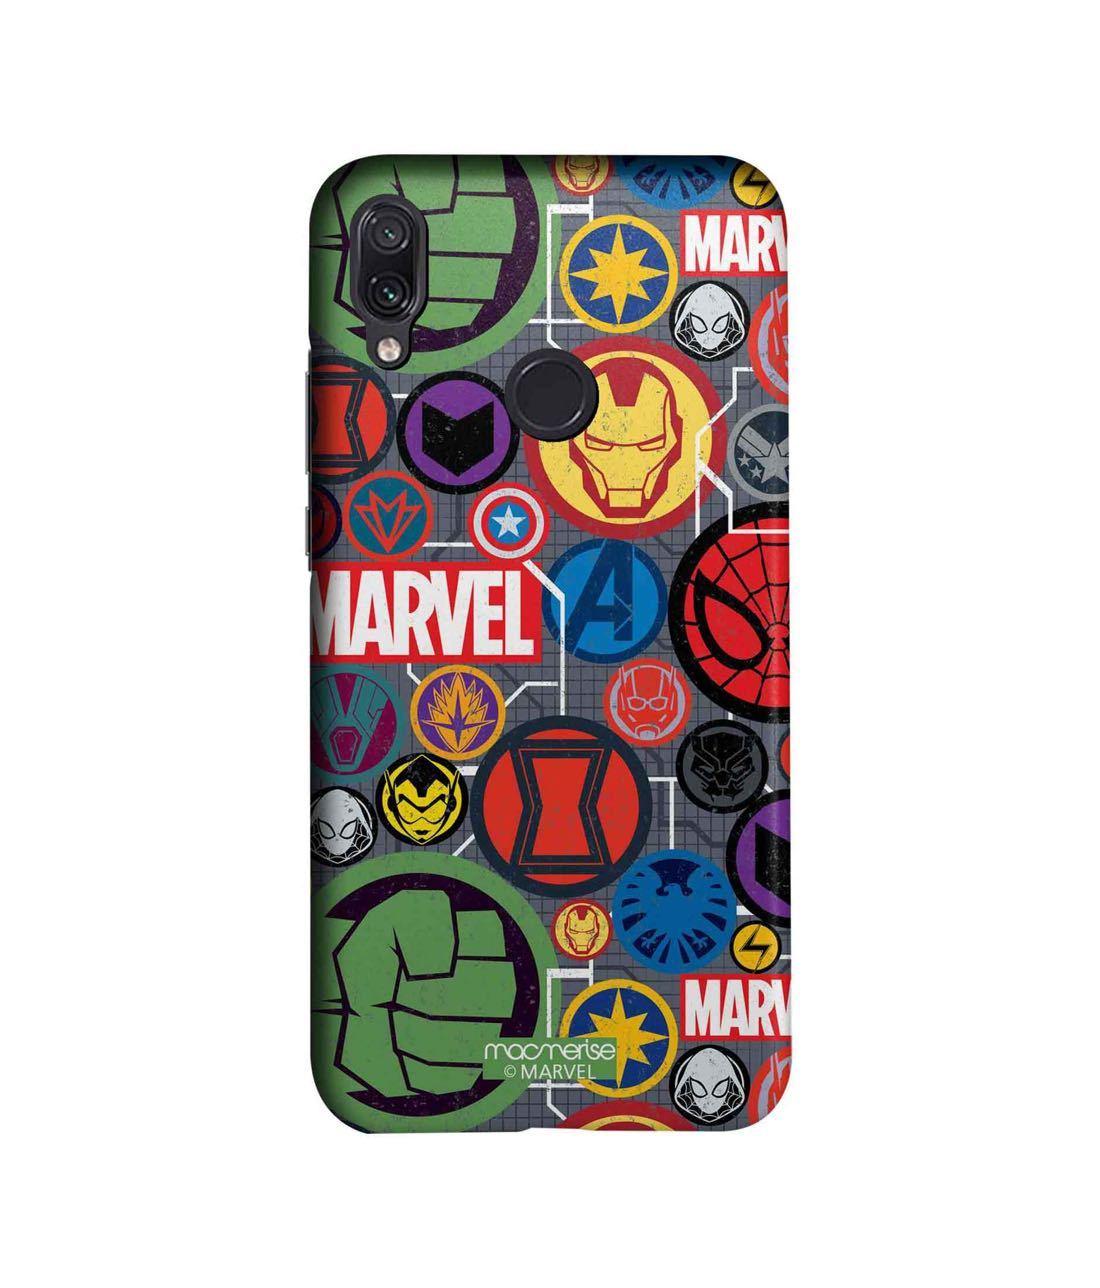 Marvel Iconic Mashup - Sleek Phone Case for Xiaomi Redmi Note 7 Pro